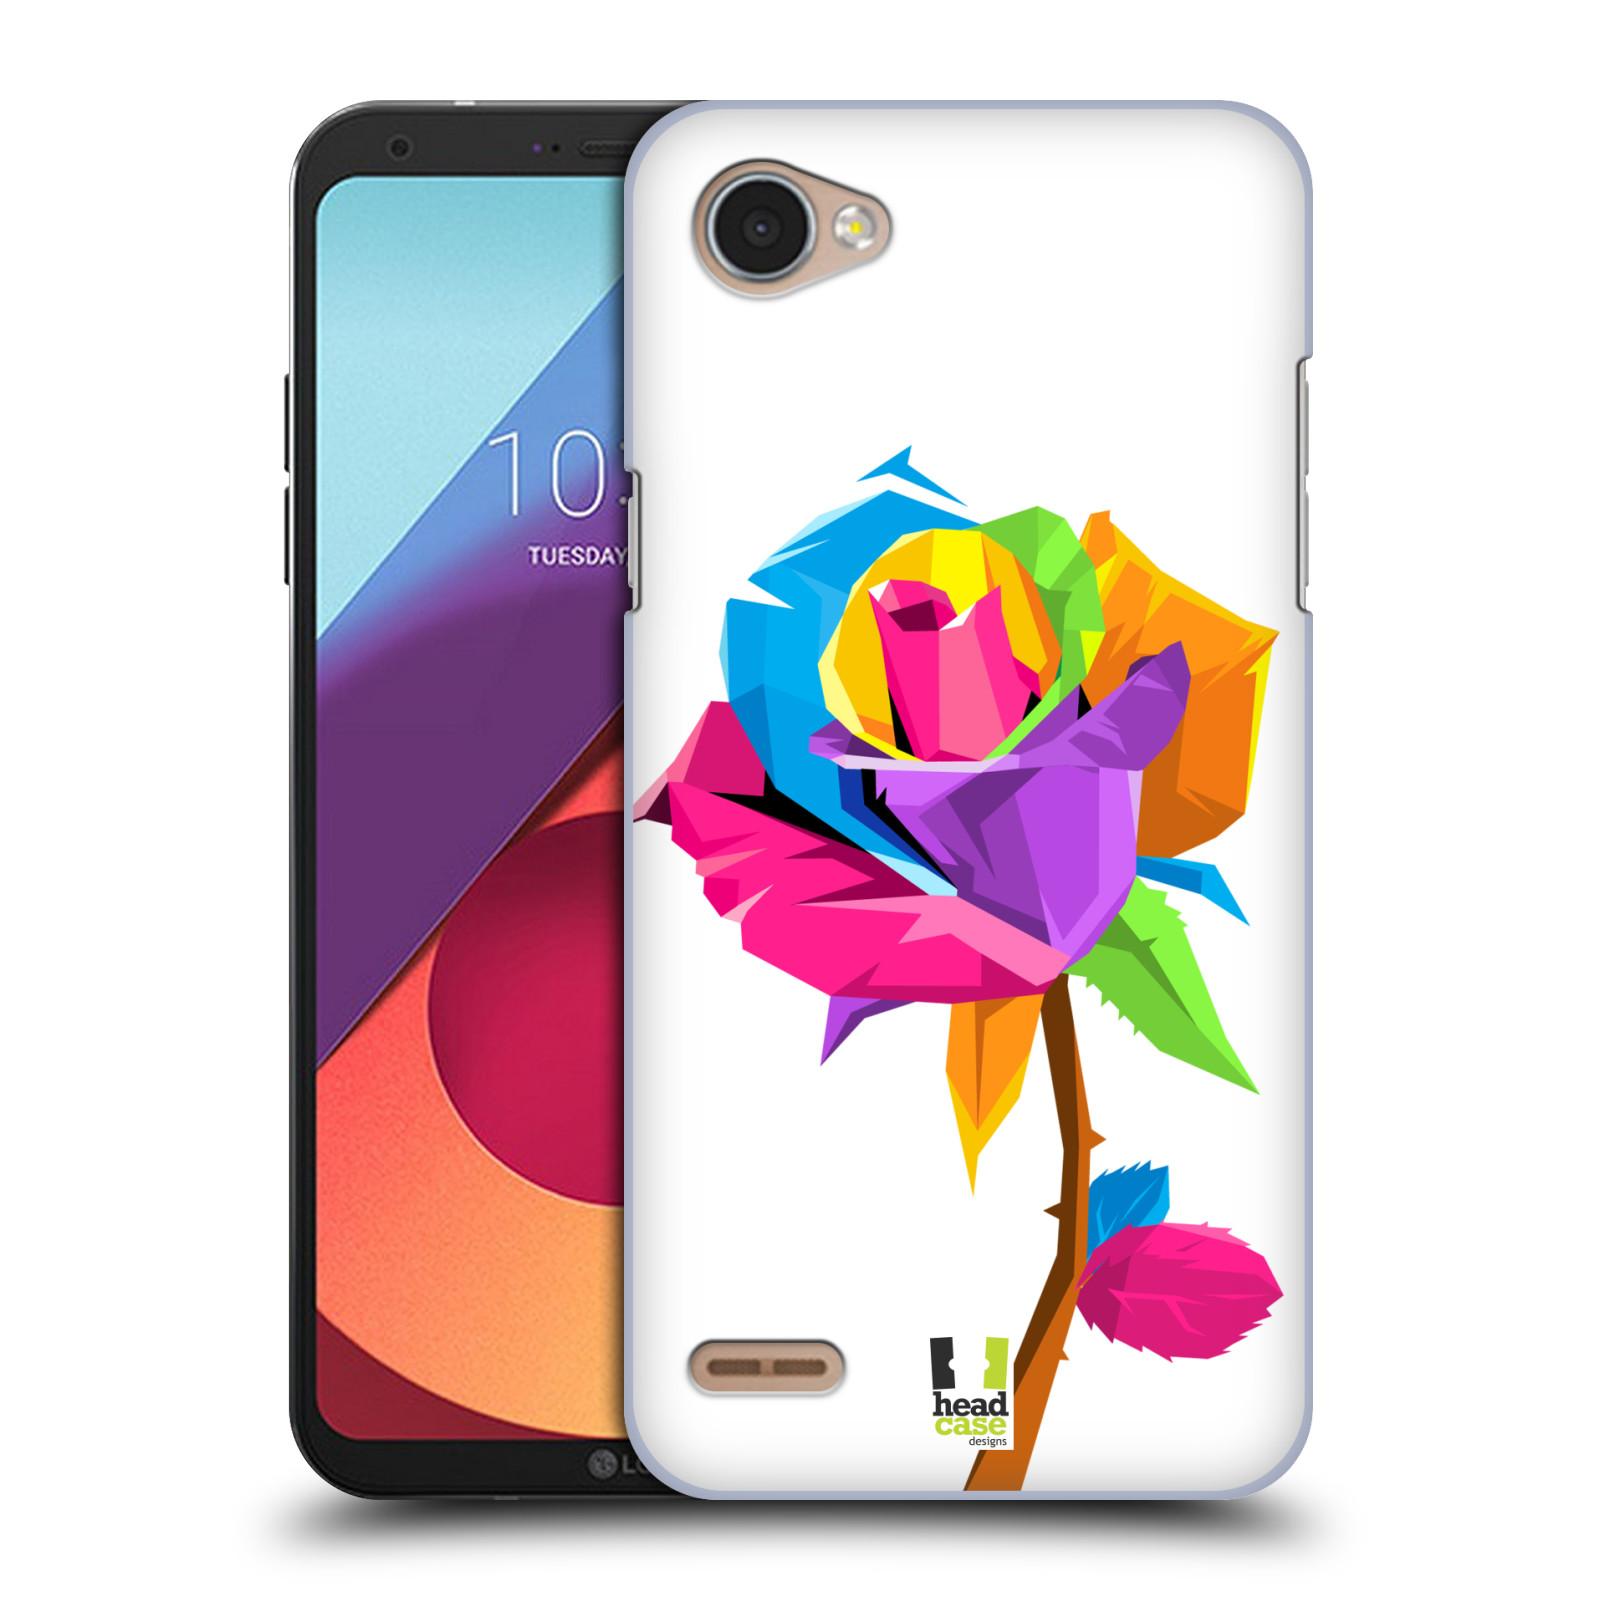 HEAD CASE plastový obal na mobil LG Q6 / Q6 PLUS vzor POP ART kubismus růže